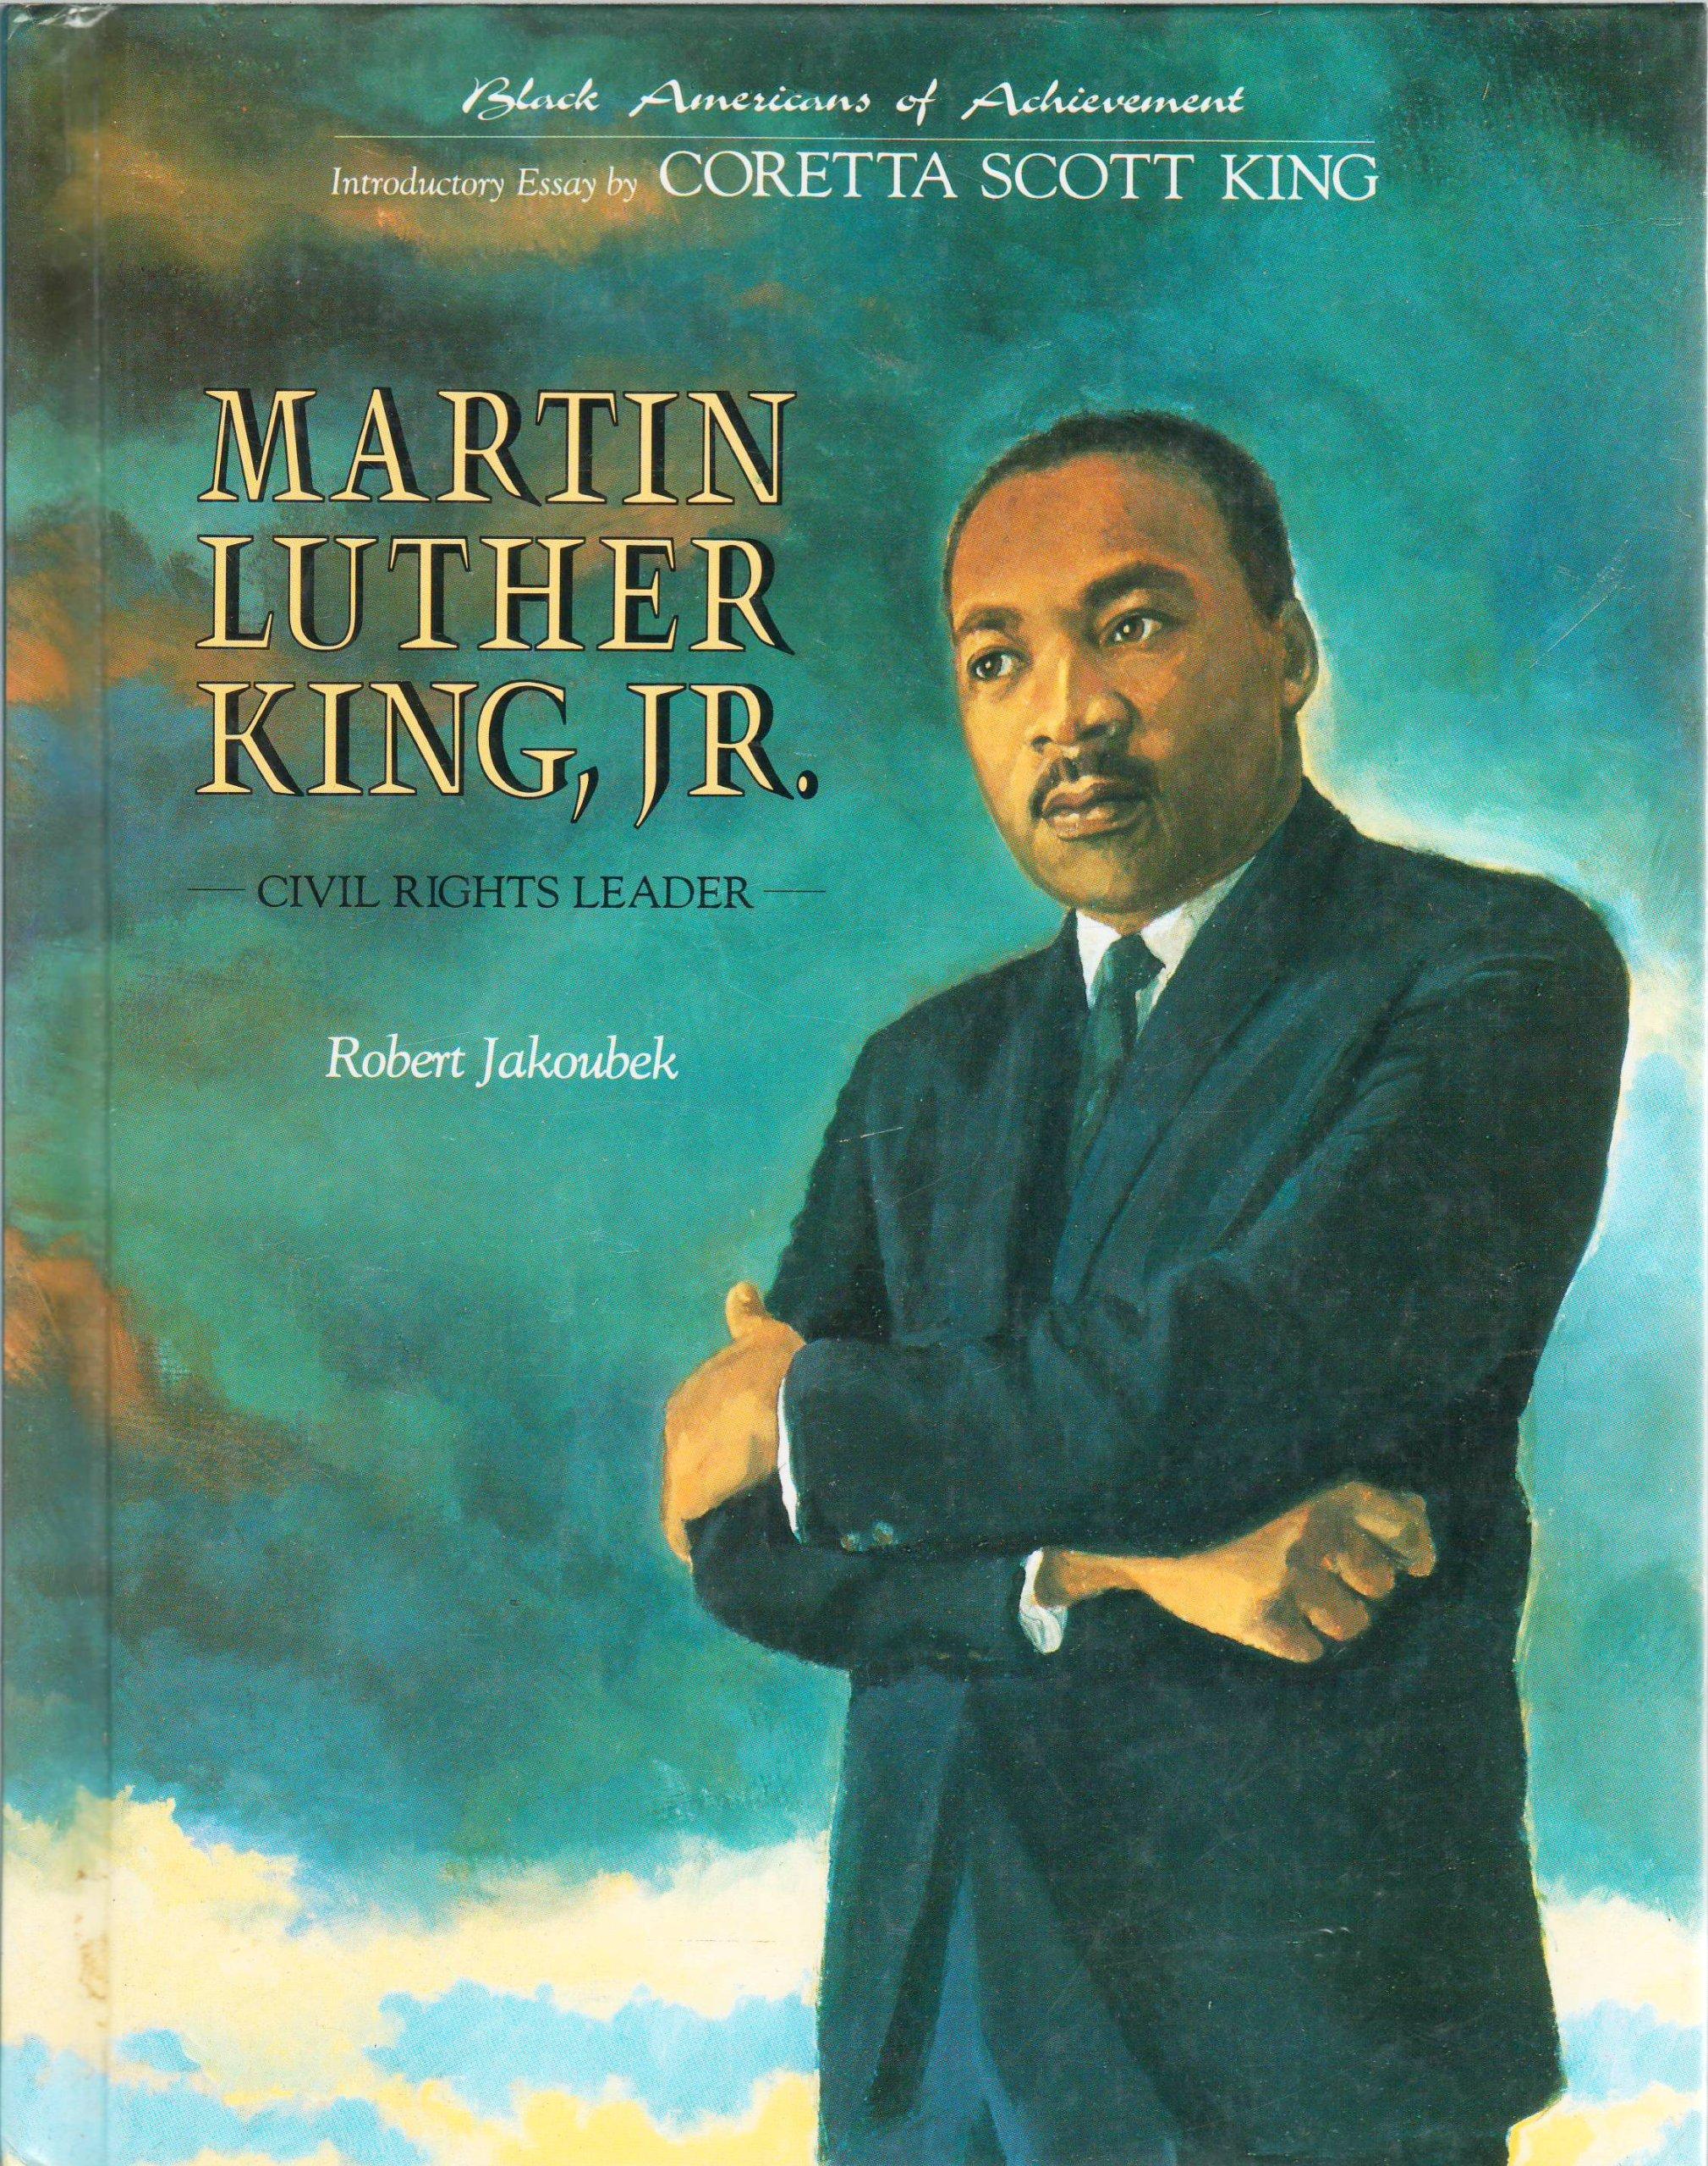 Martin Luther King, Jr. (Black Americans of Achievement), Robert E. Jakoubek